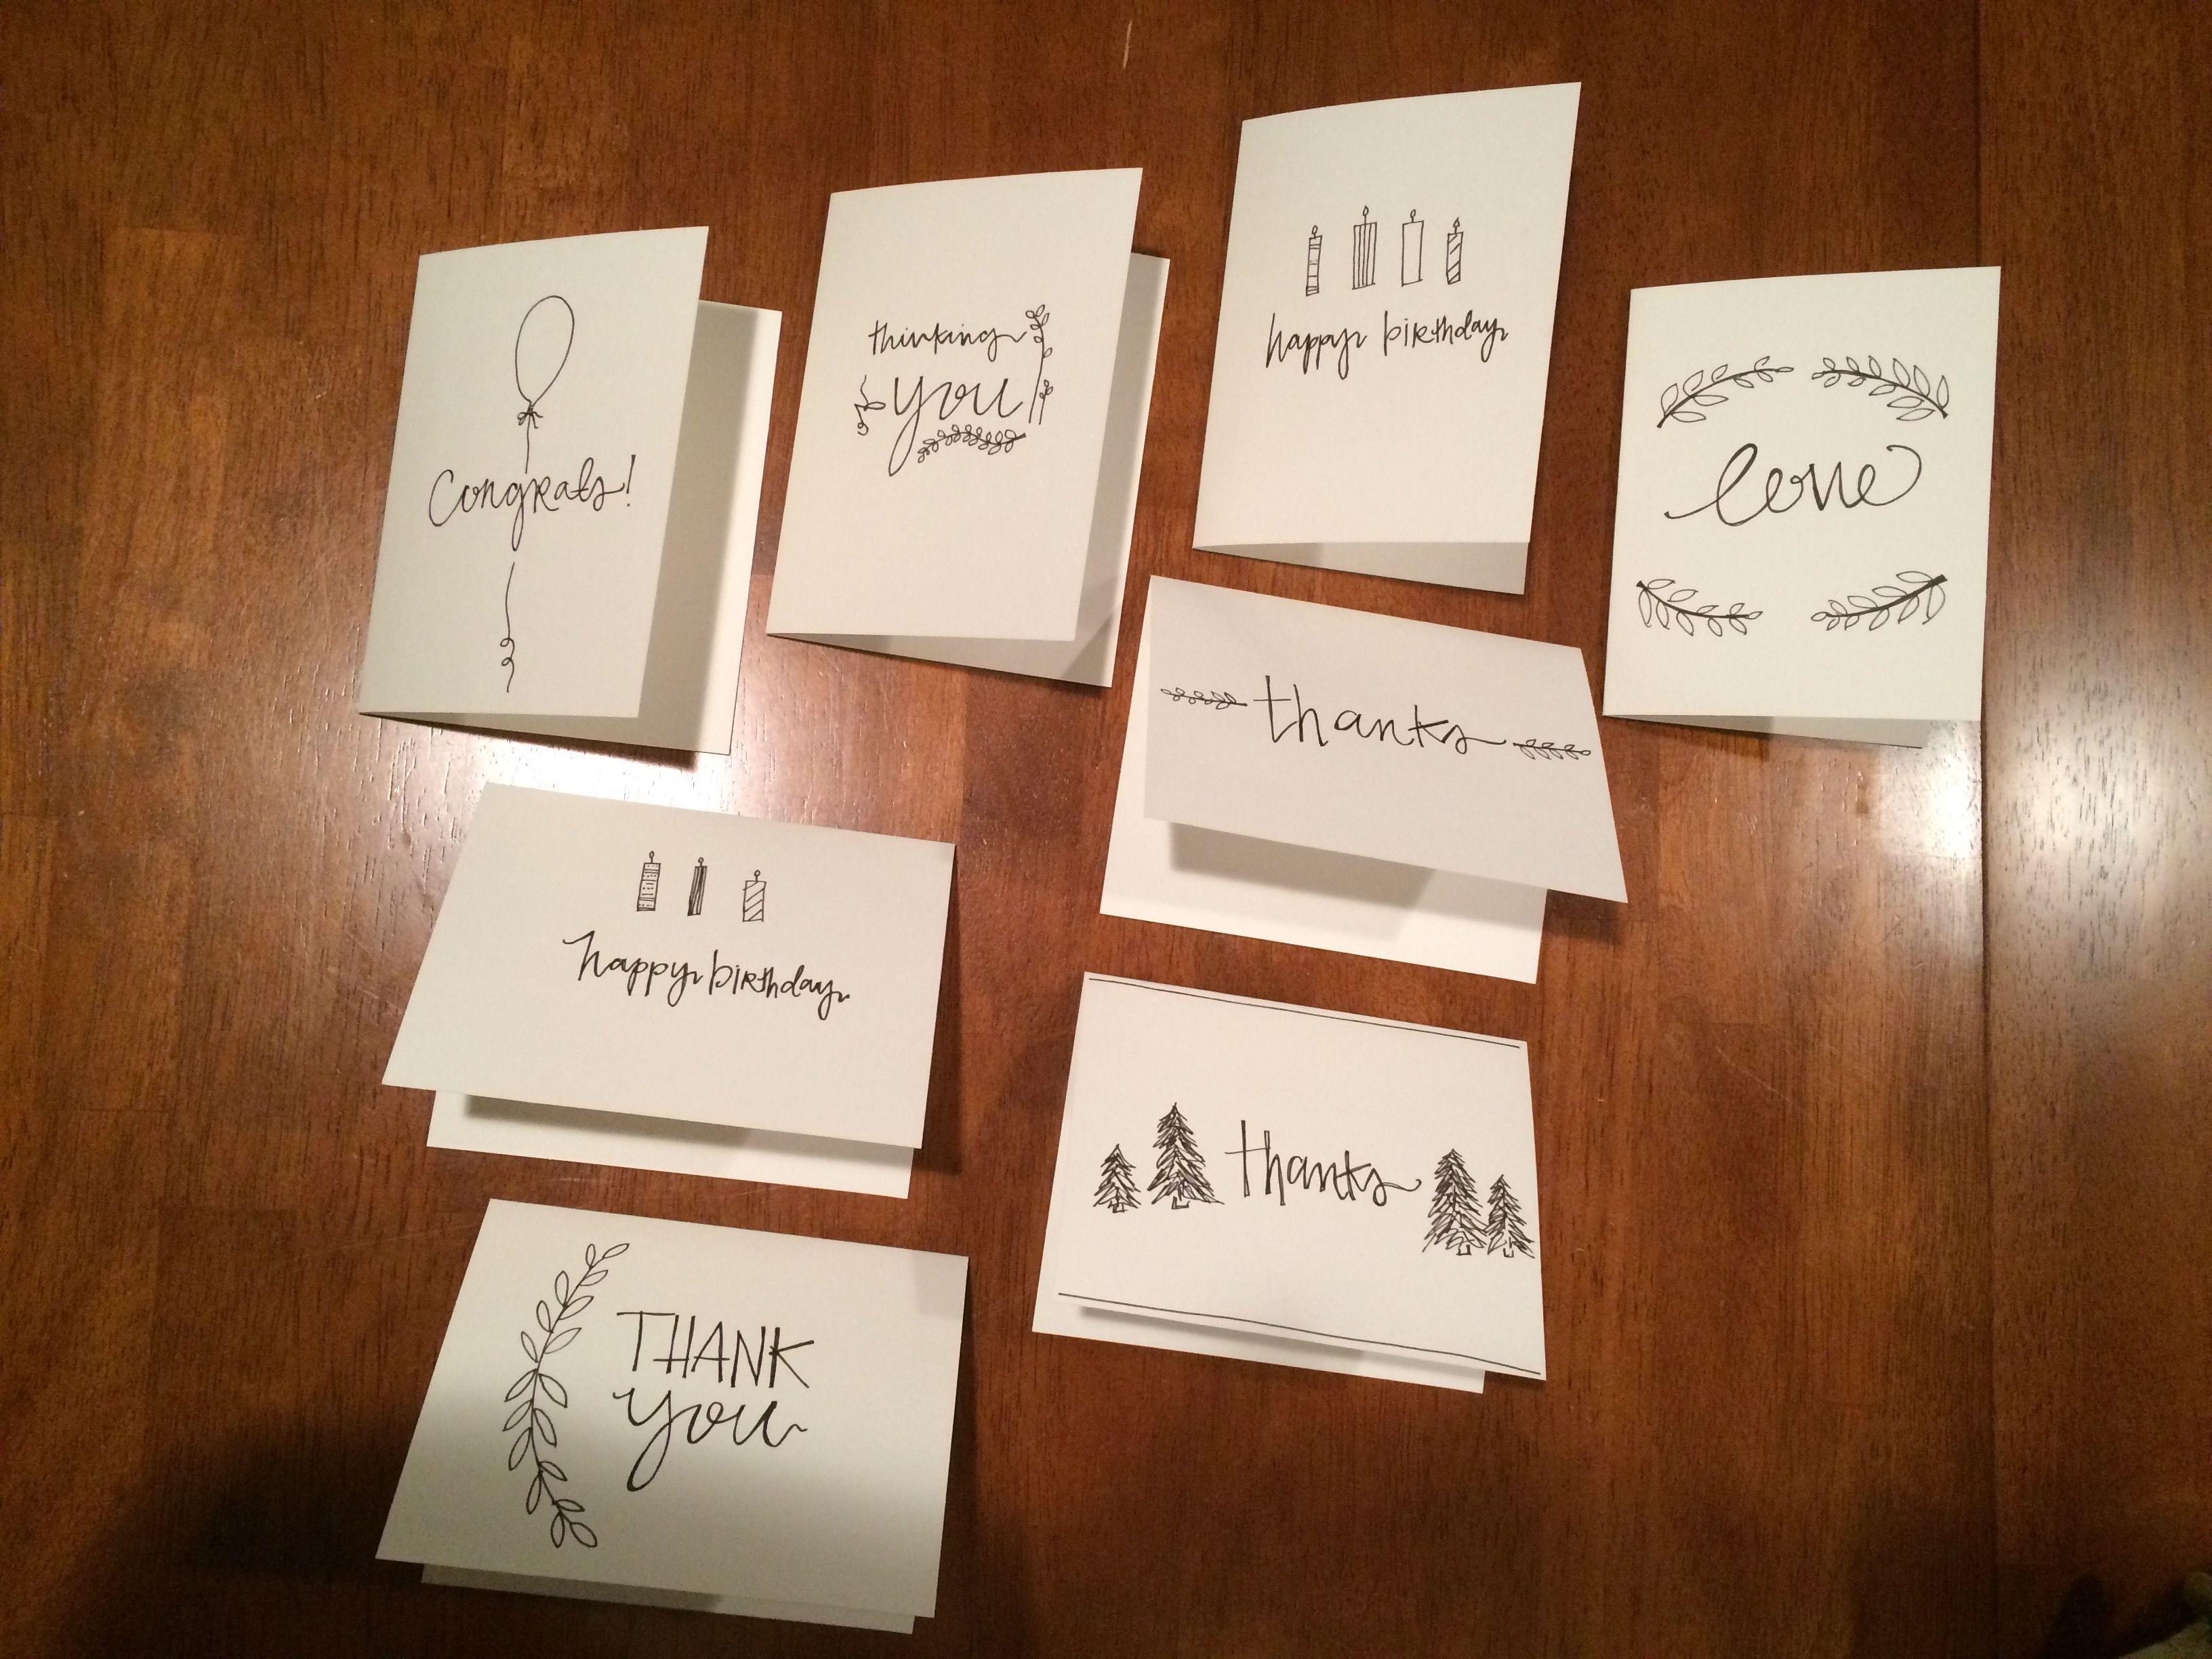 Cards -Doodles by Biz Warner vsco.co/ebizw